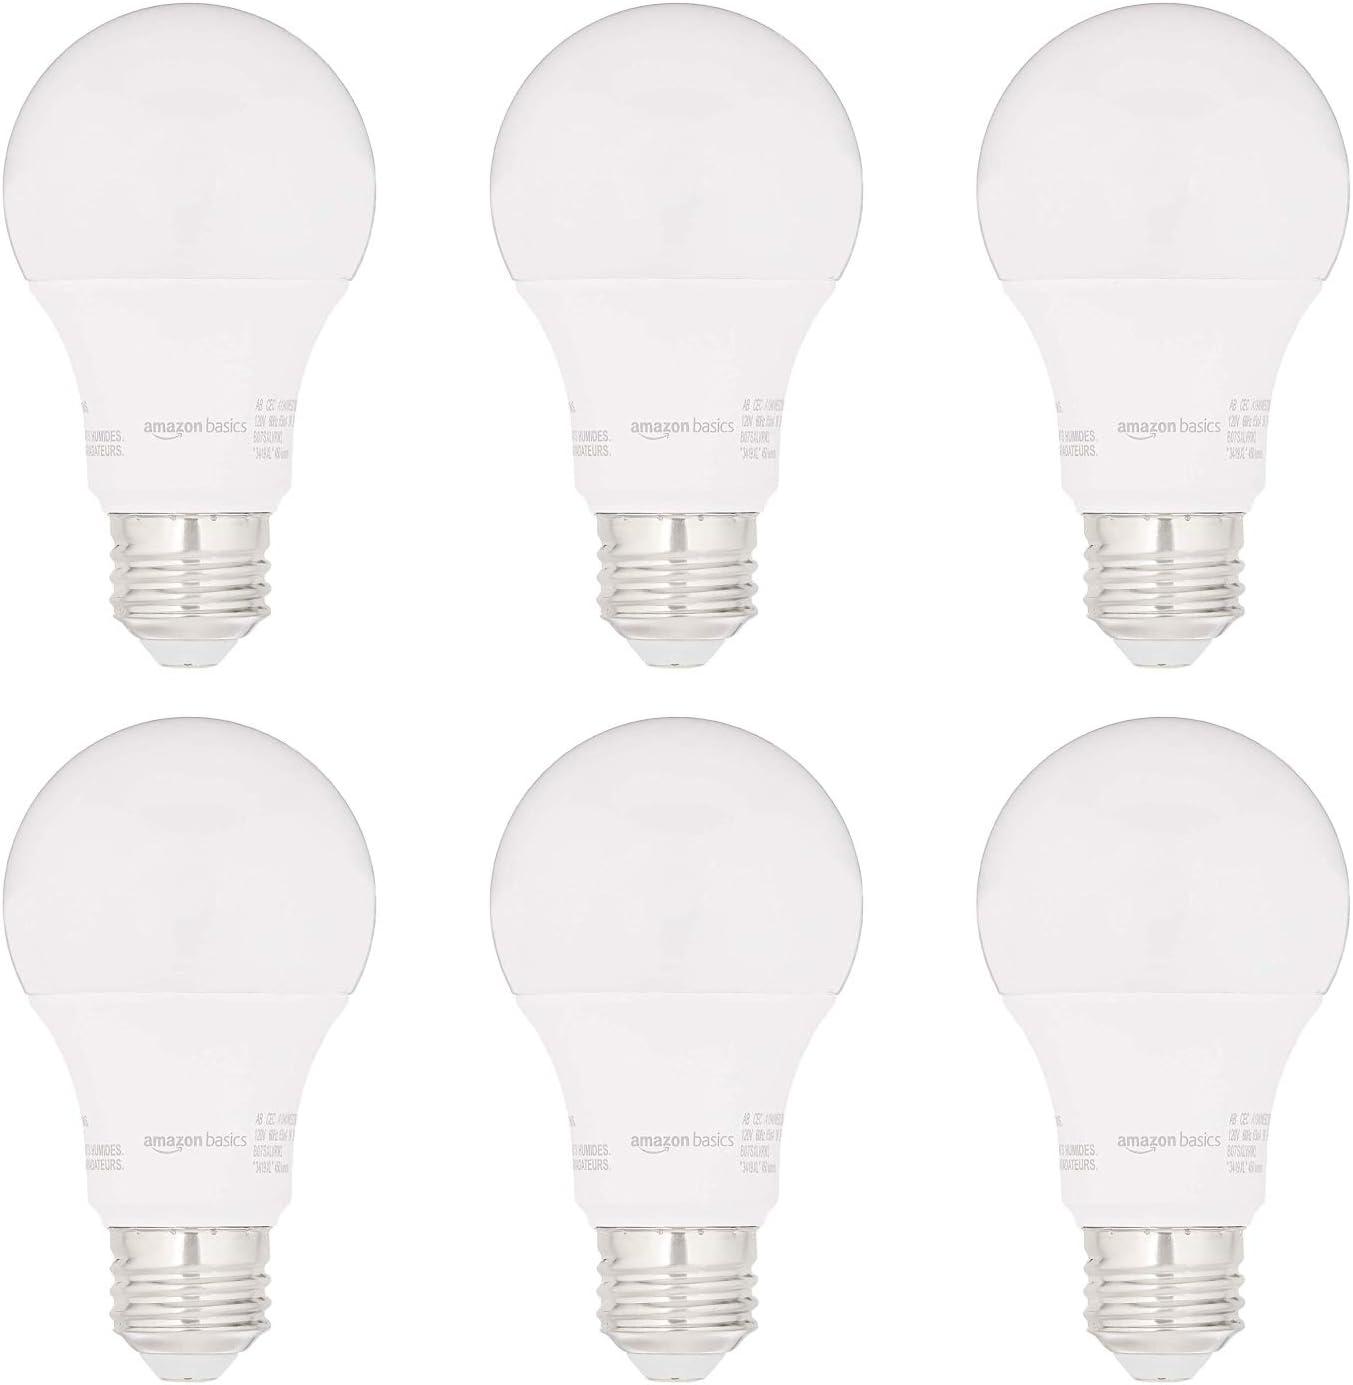 AmazonBasics 40W Equivalent, Soft White, Non-Dimmable, 15,000 Hour Lifetime, CEC Compliant, A19 LED Light Bulbs | 6-Pack